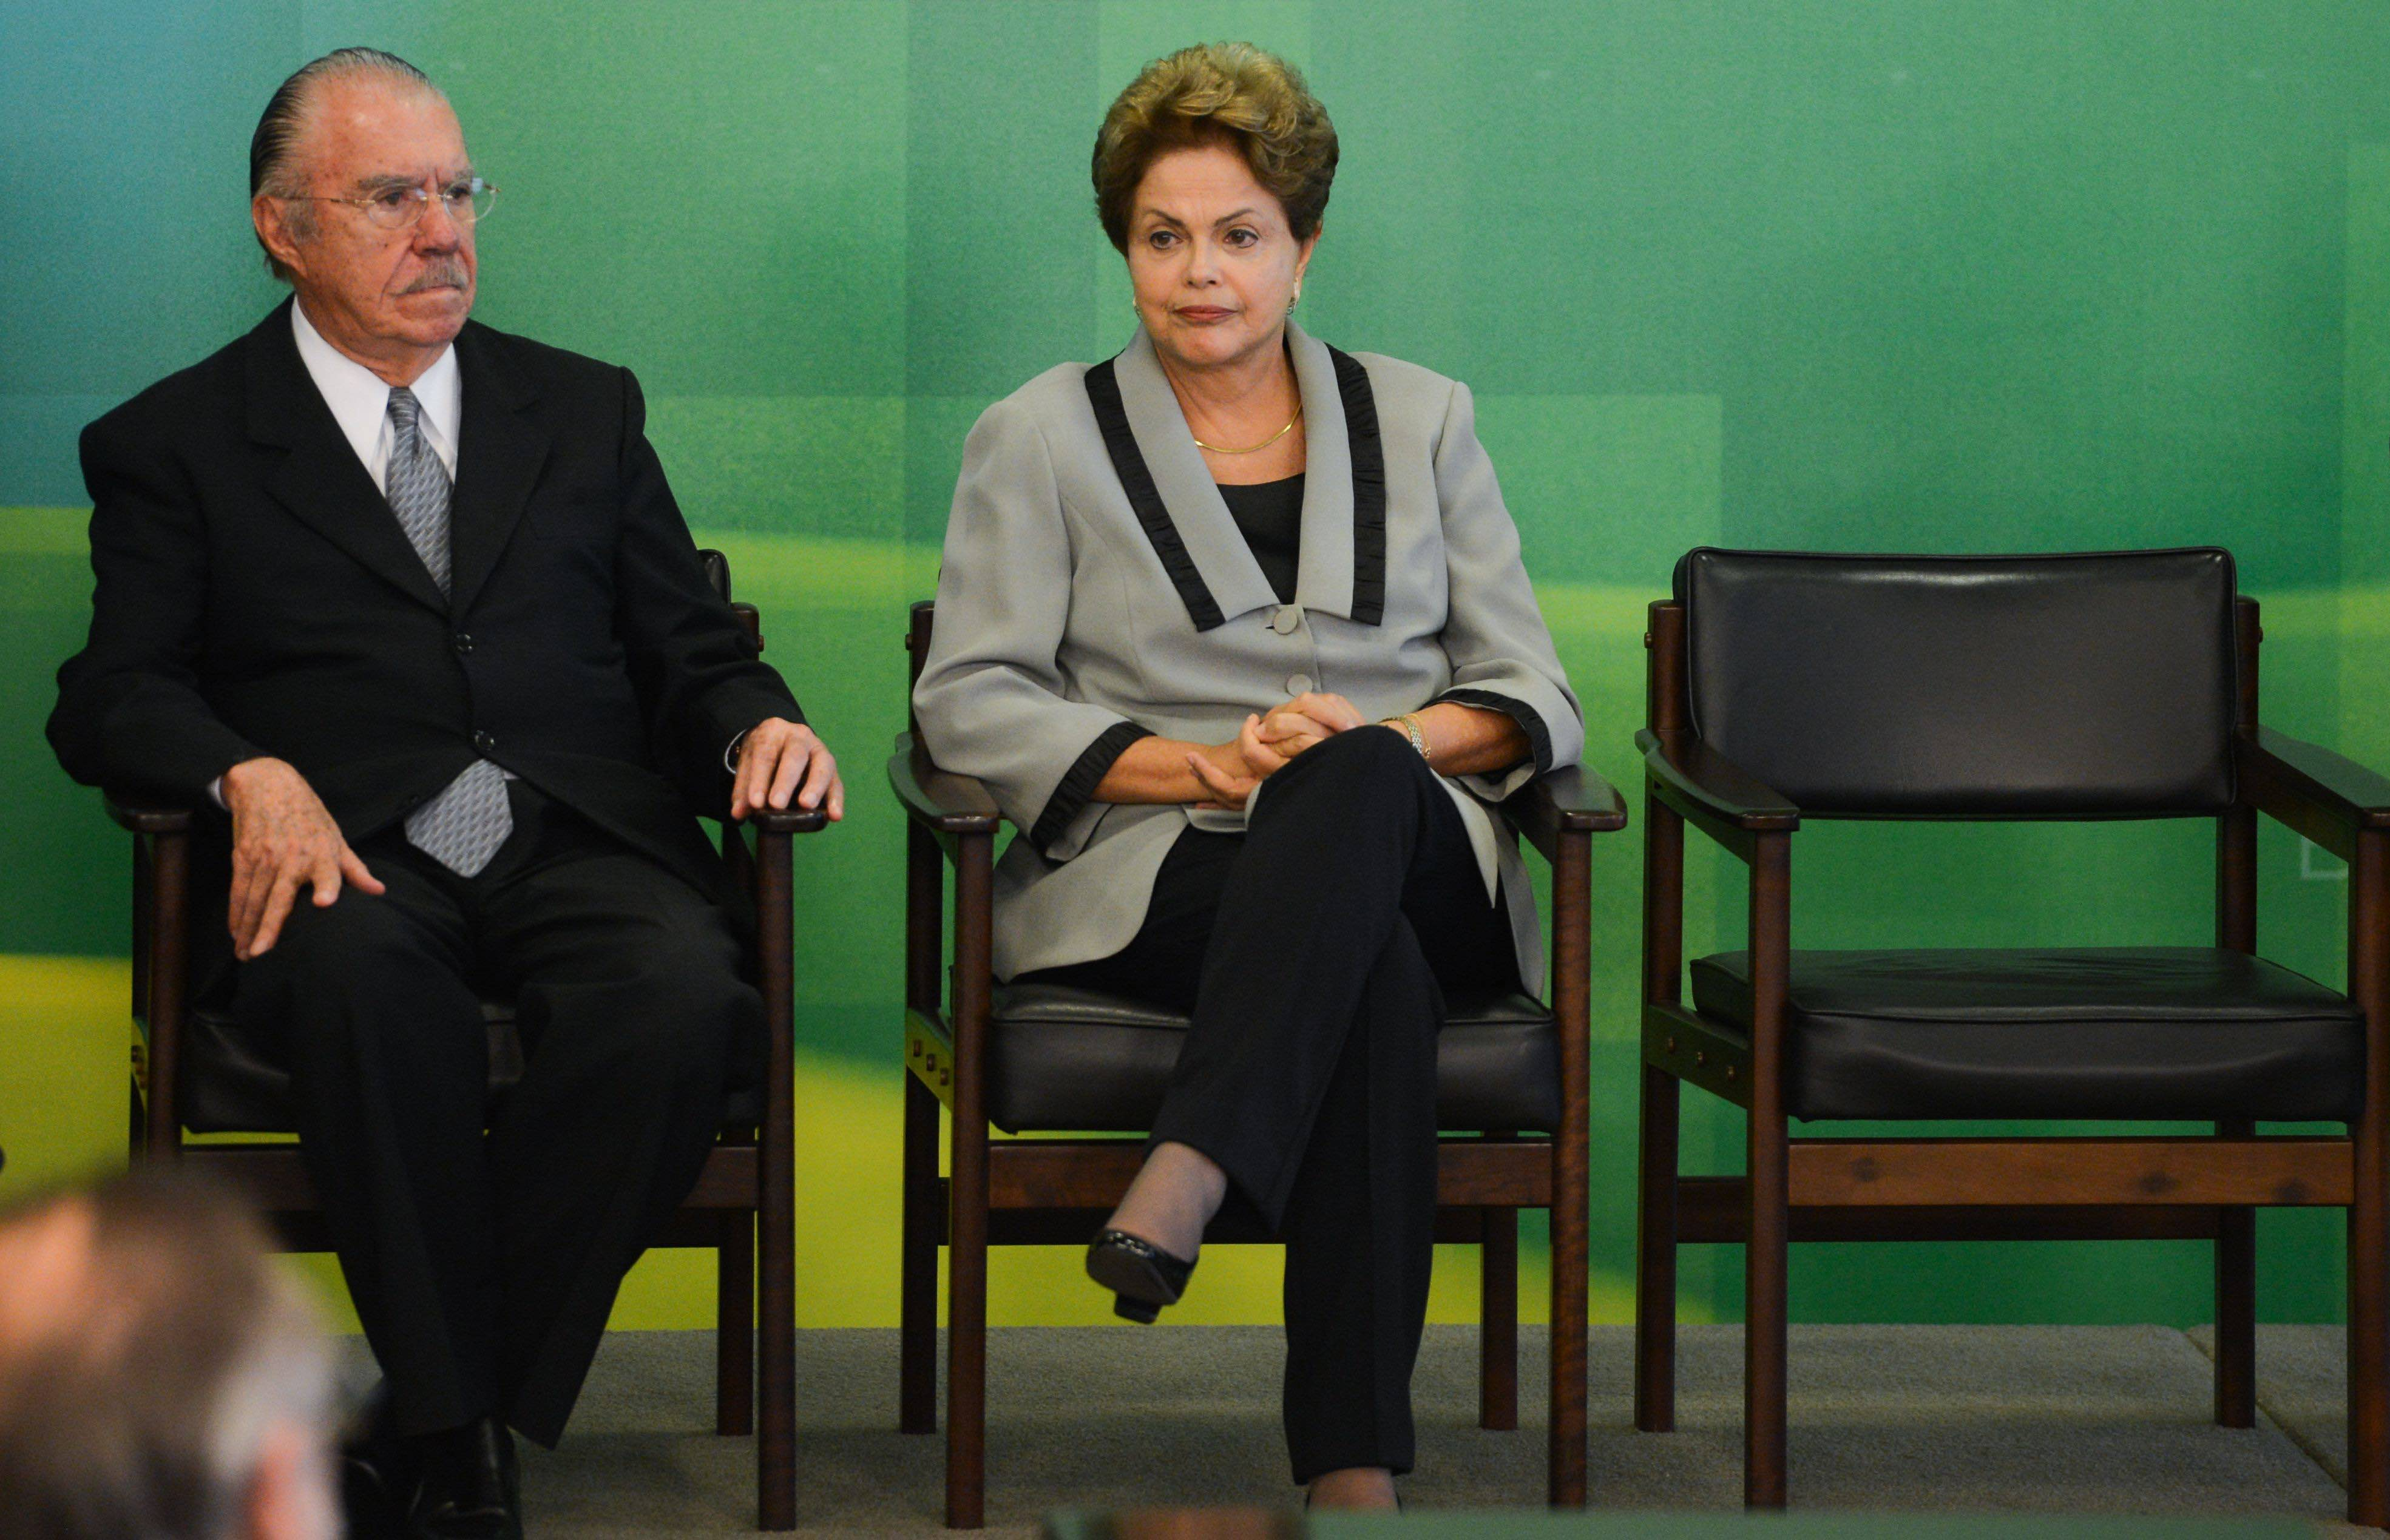 Dilma-Rousseff-Sancao-Codigo-Civil-foto-Jose-Cruz-Agencia-Brasil-16mar2015